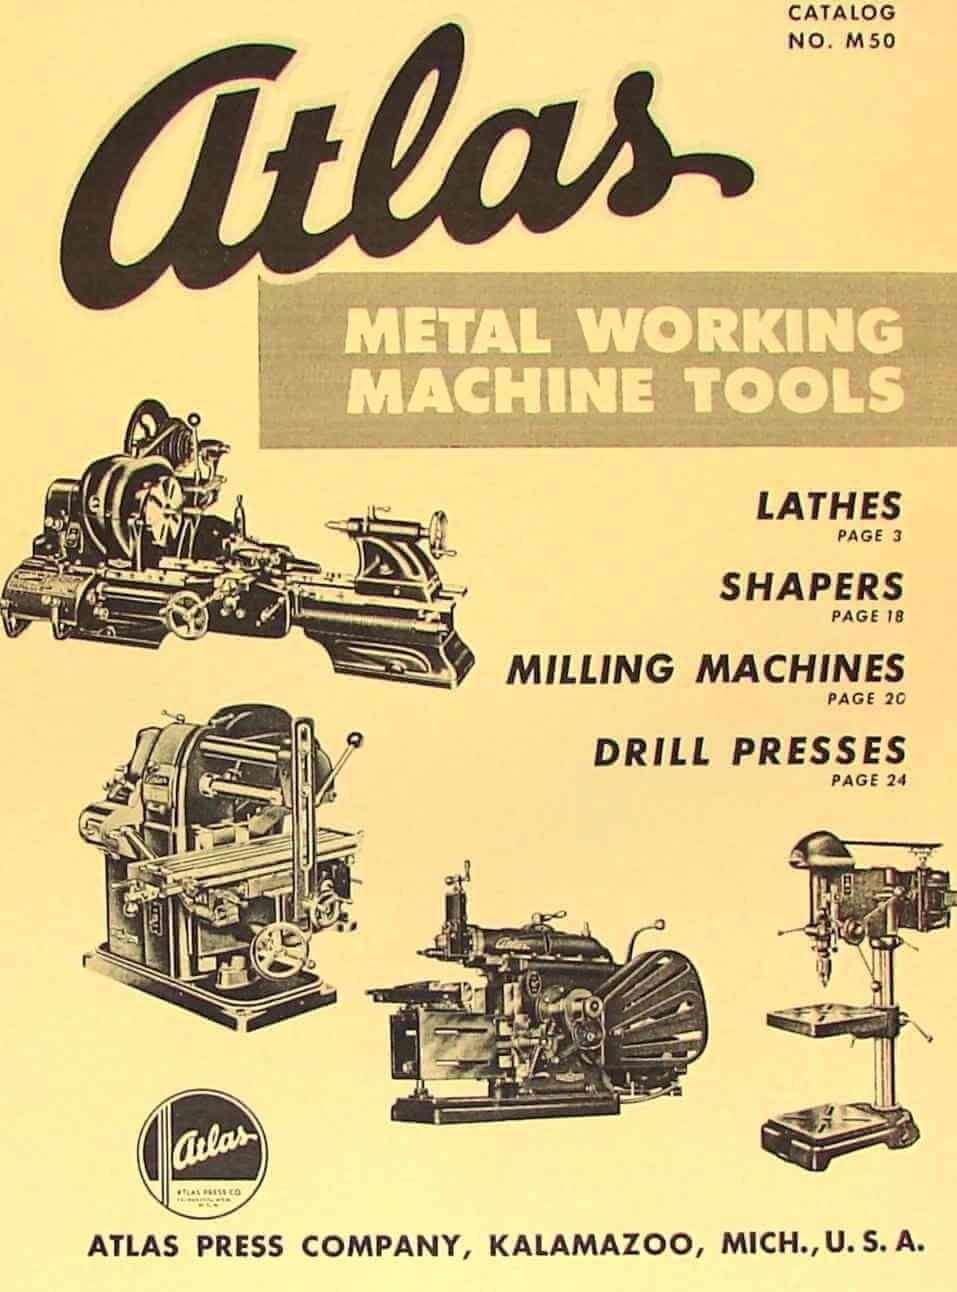 Atlas Press Co Lathe Shaper Mill Drill Press Catalog